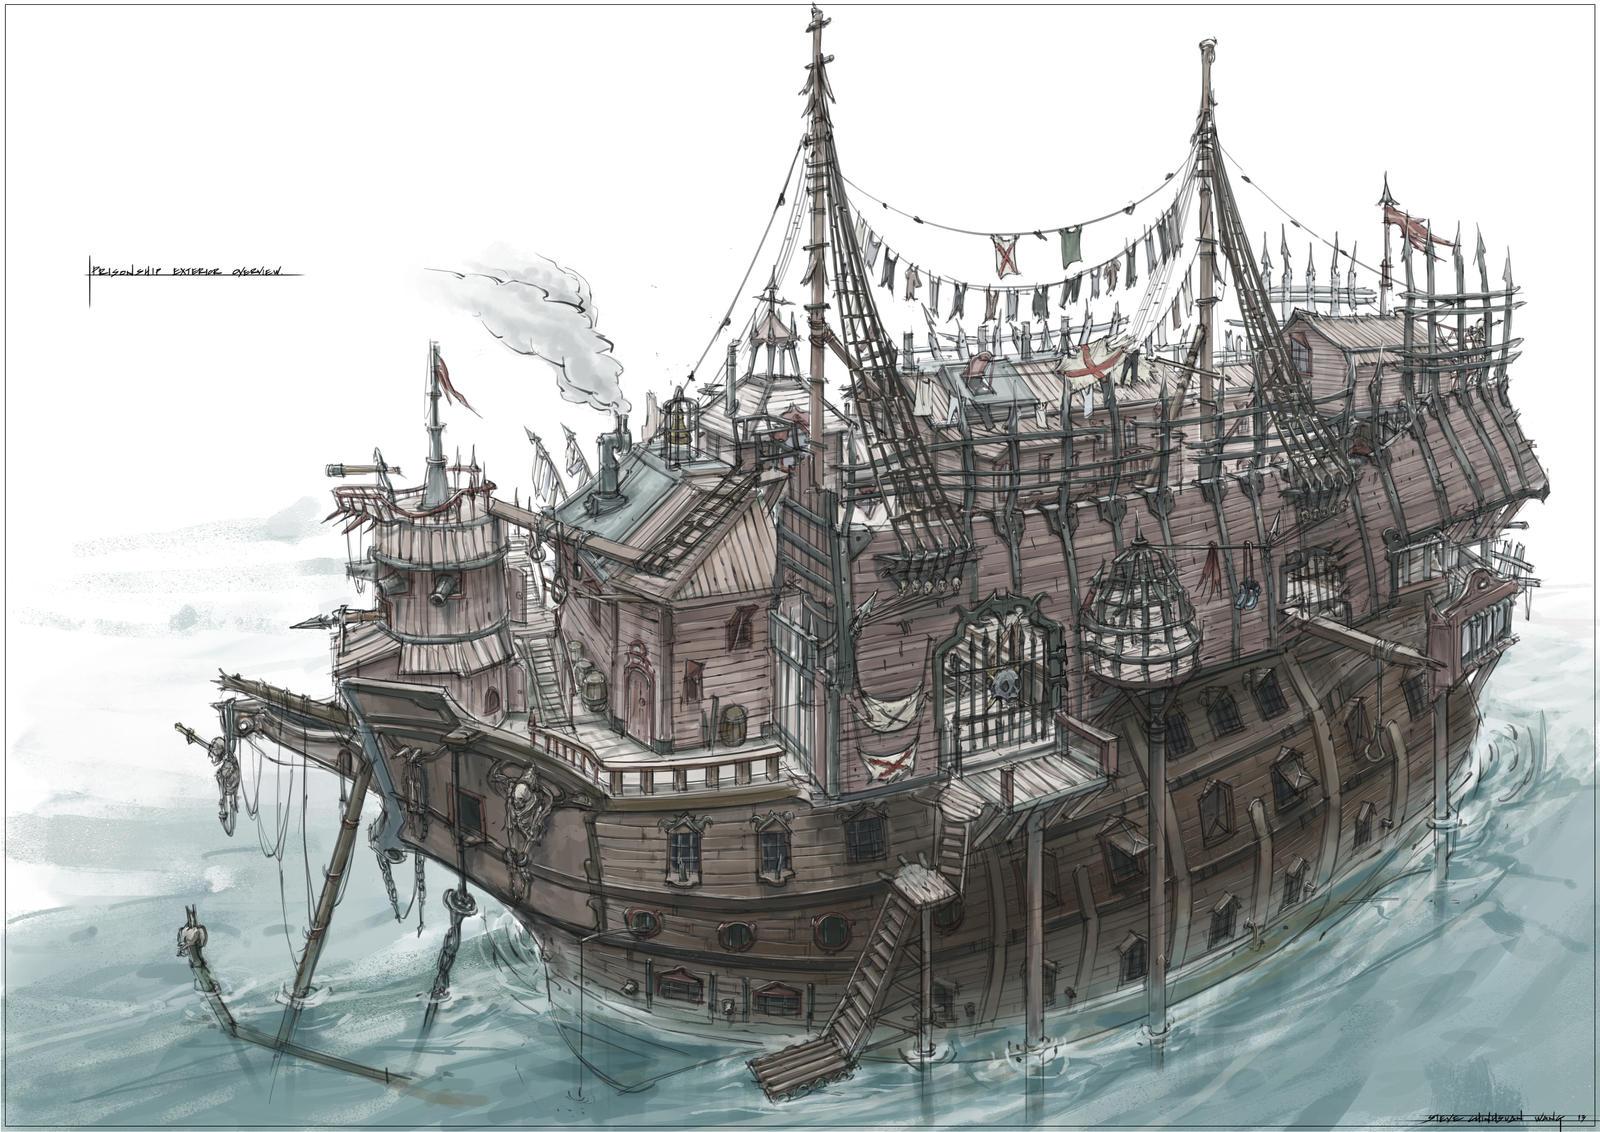 Prison Ship by Sketchshido on DeviantArt